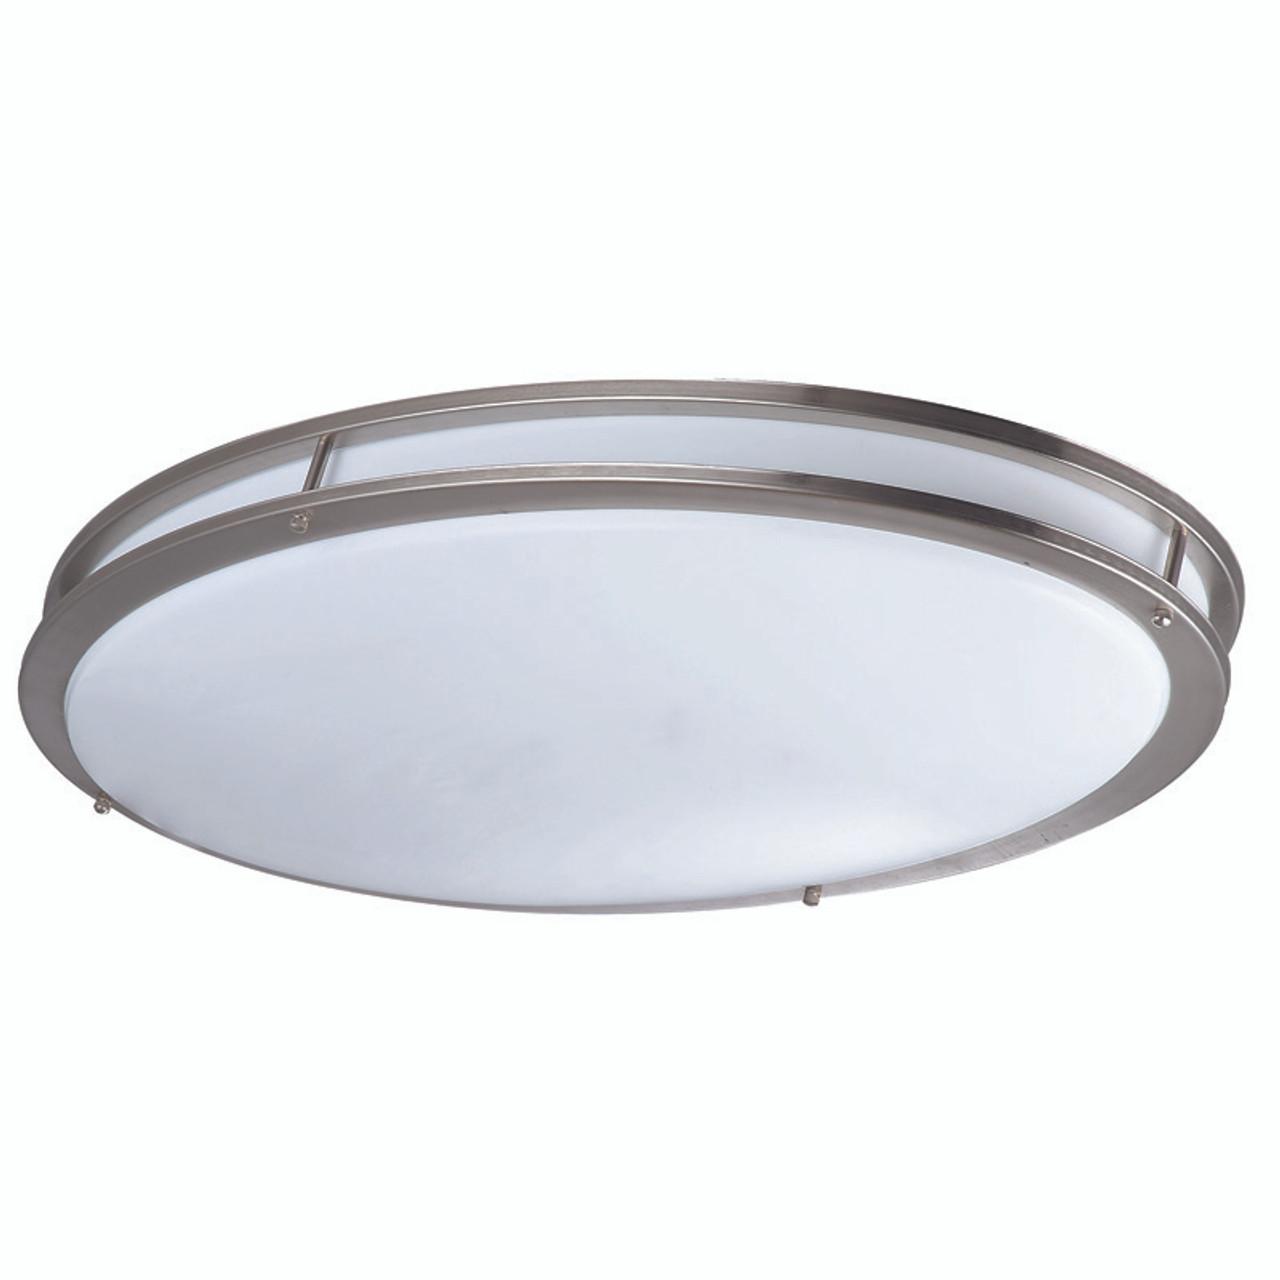 LED Ceiling Fixture   48W 4000K 4000 Lumen    DC032D-4000K   LightingAndSupplies.com